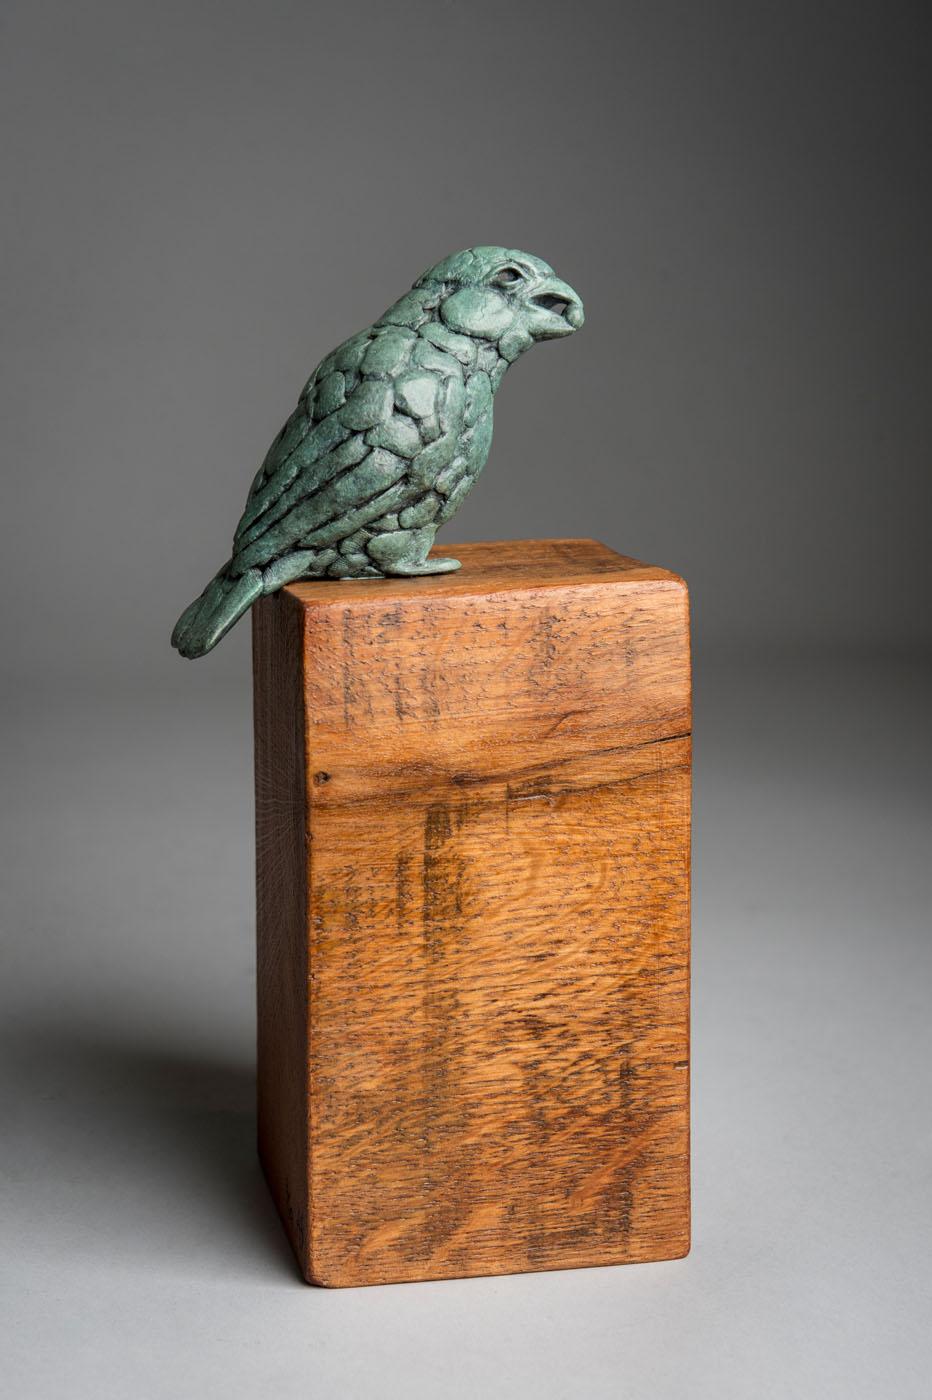 Bronze sculpture of a Darwin Finch bird by artist Anthony Smith